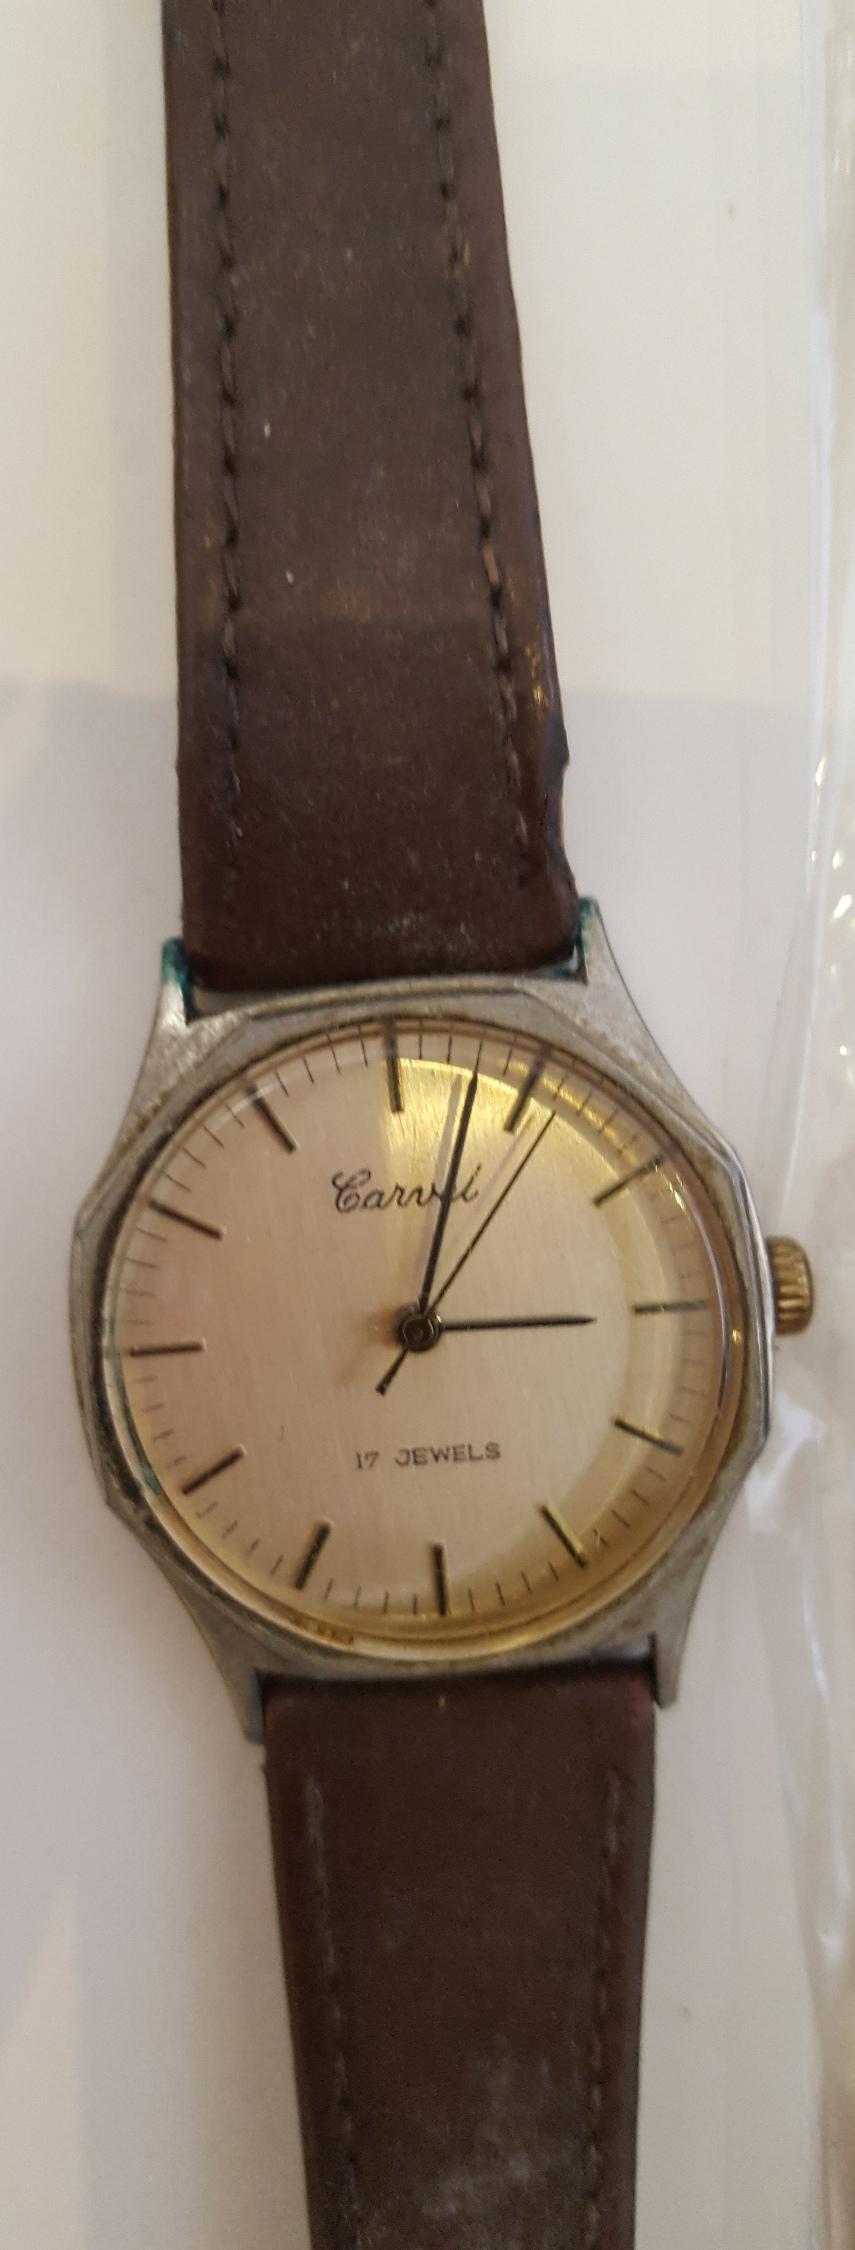 Lot 21 - Vintage Wrist Watches 1 x Carvel 17 Jewels 3 x Eiger & 1 x Limit